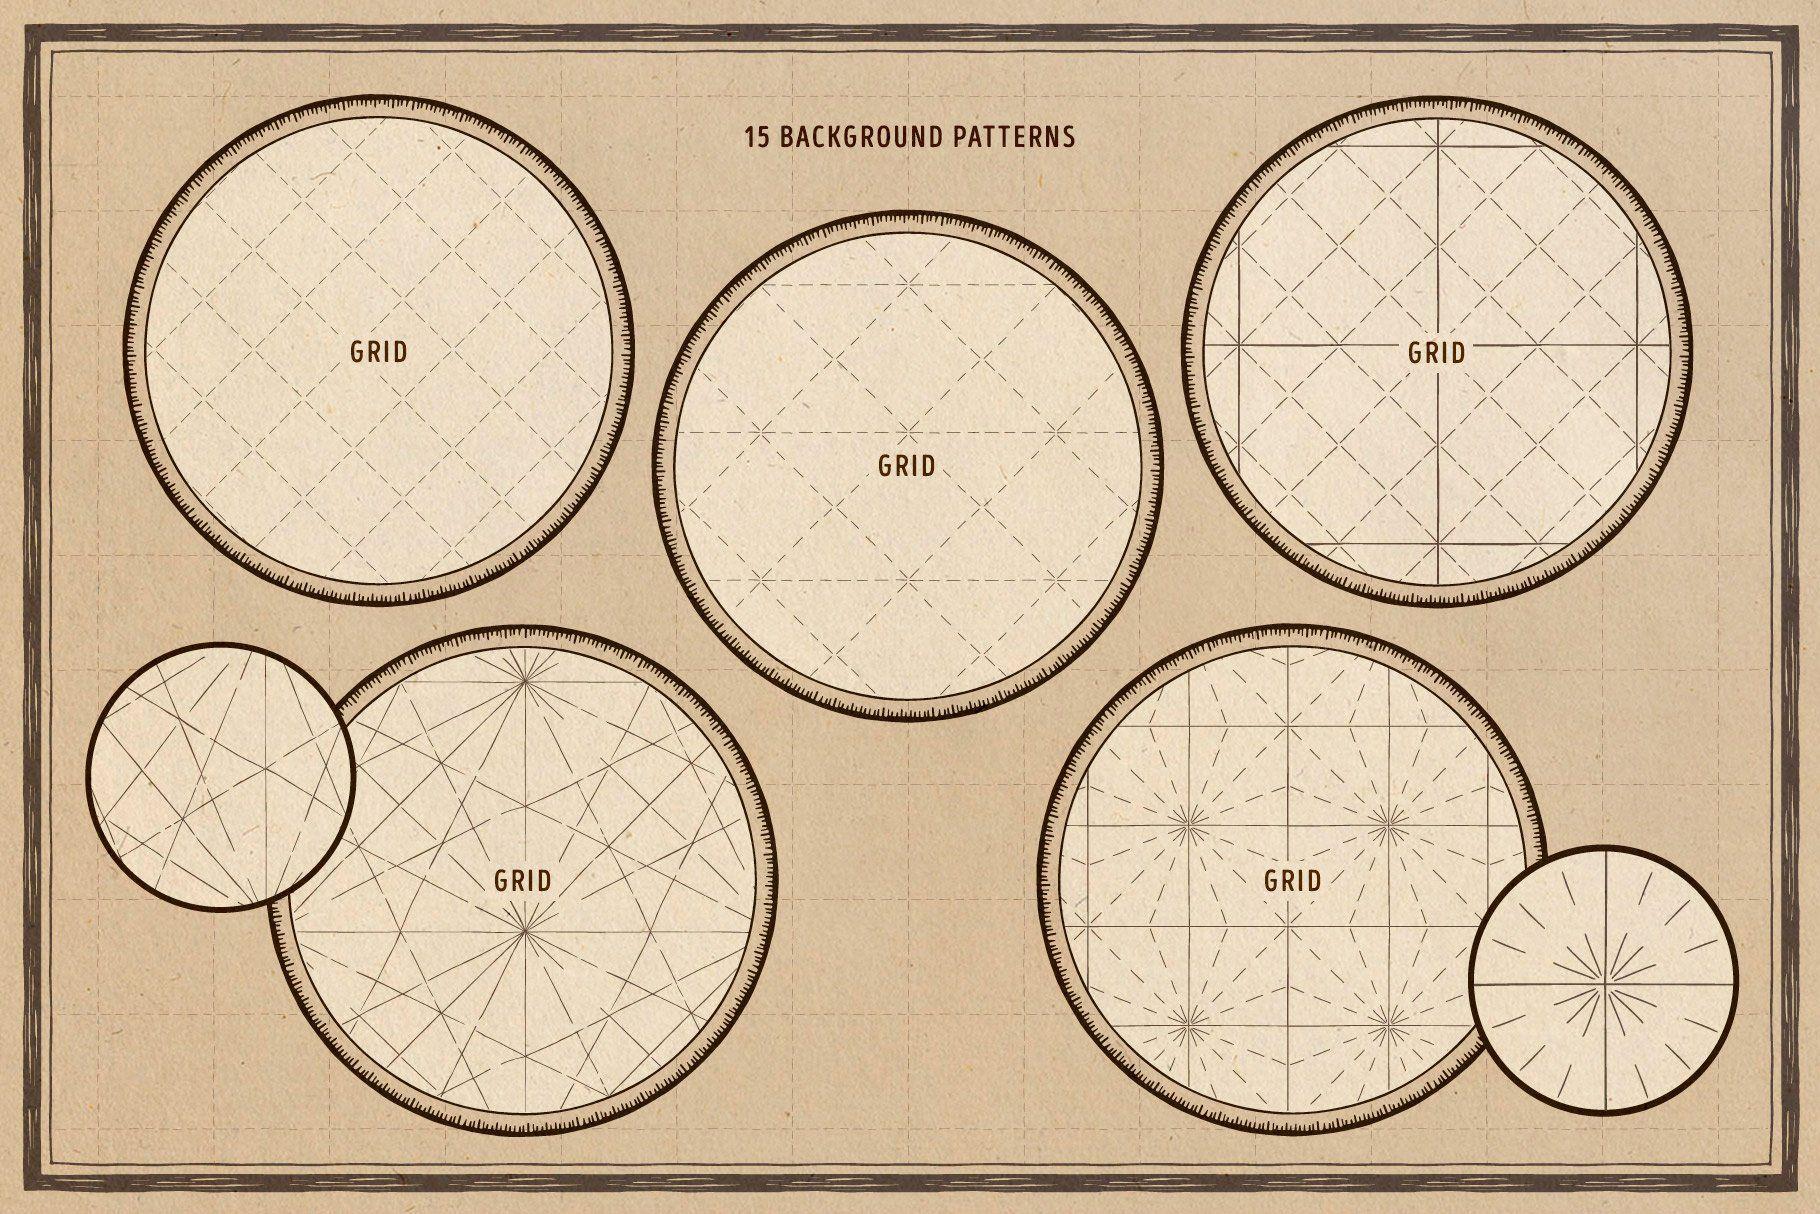 Magic Lands Vintage Map Creator in 2020 Vintage map